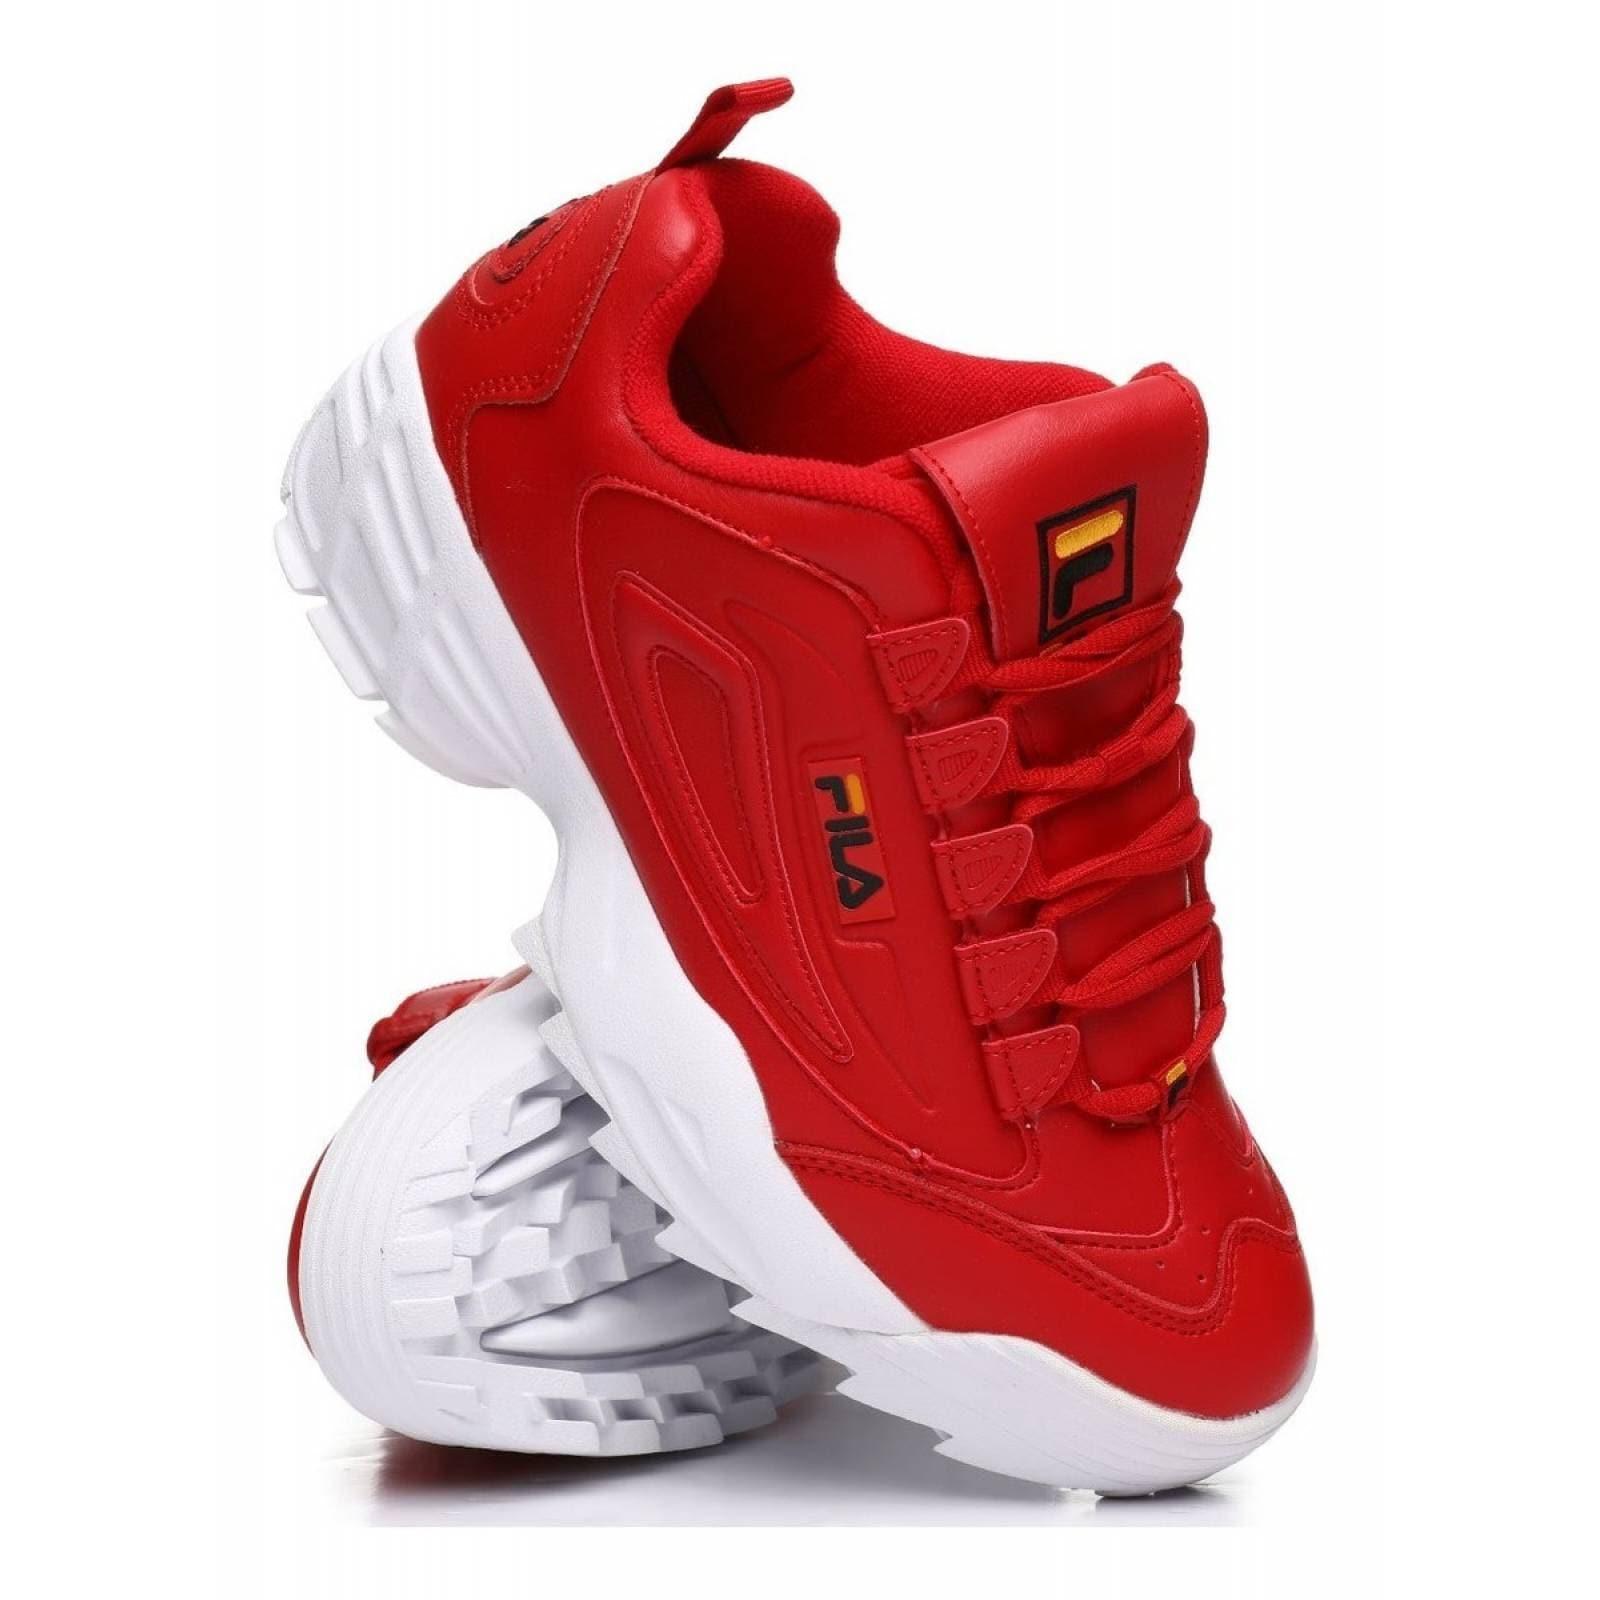 Tenis Fila rojo Disruptor 3